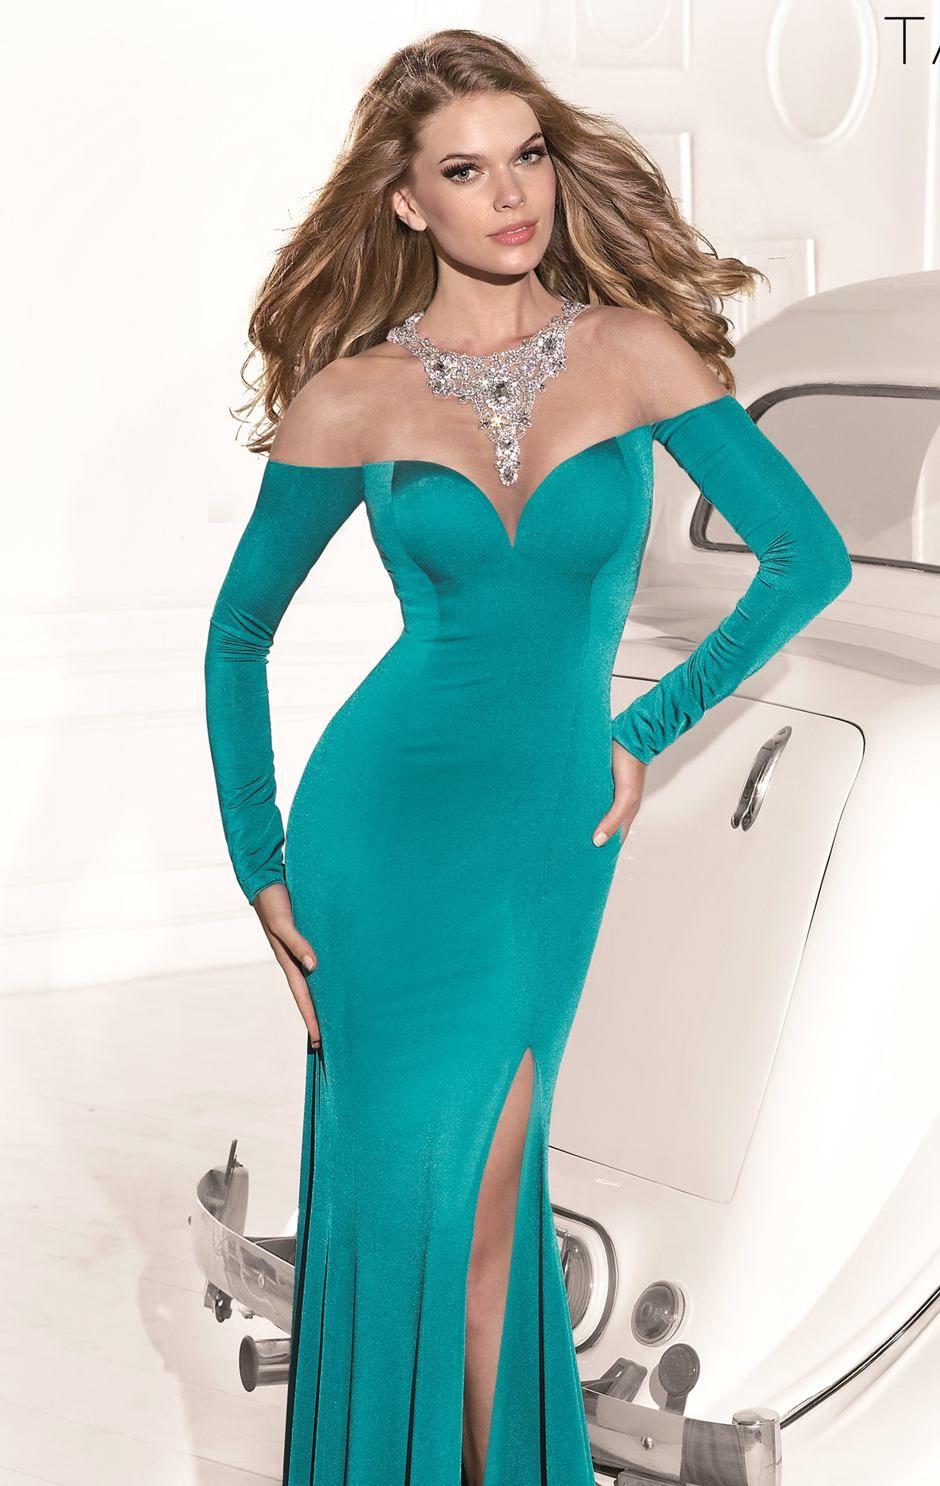 Long Sleeves Gown ~ | Ideas for graduation ball | Pinterest | Long ...